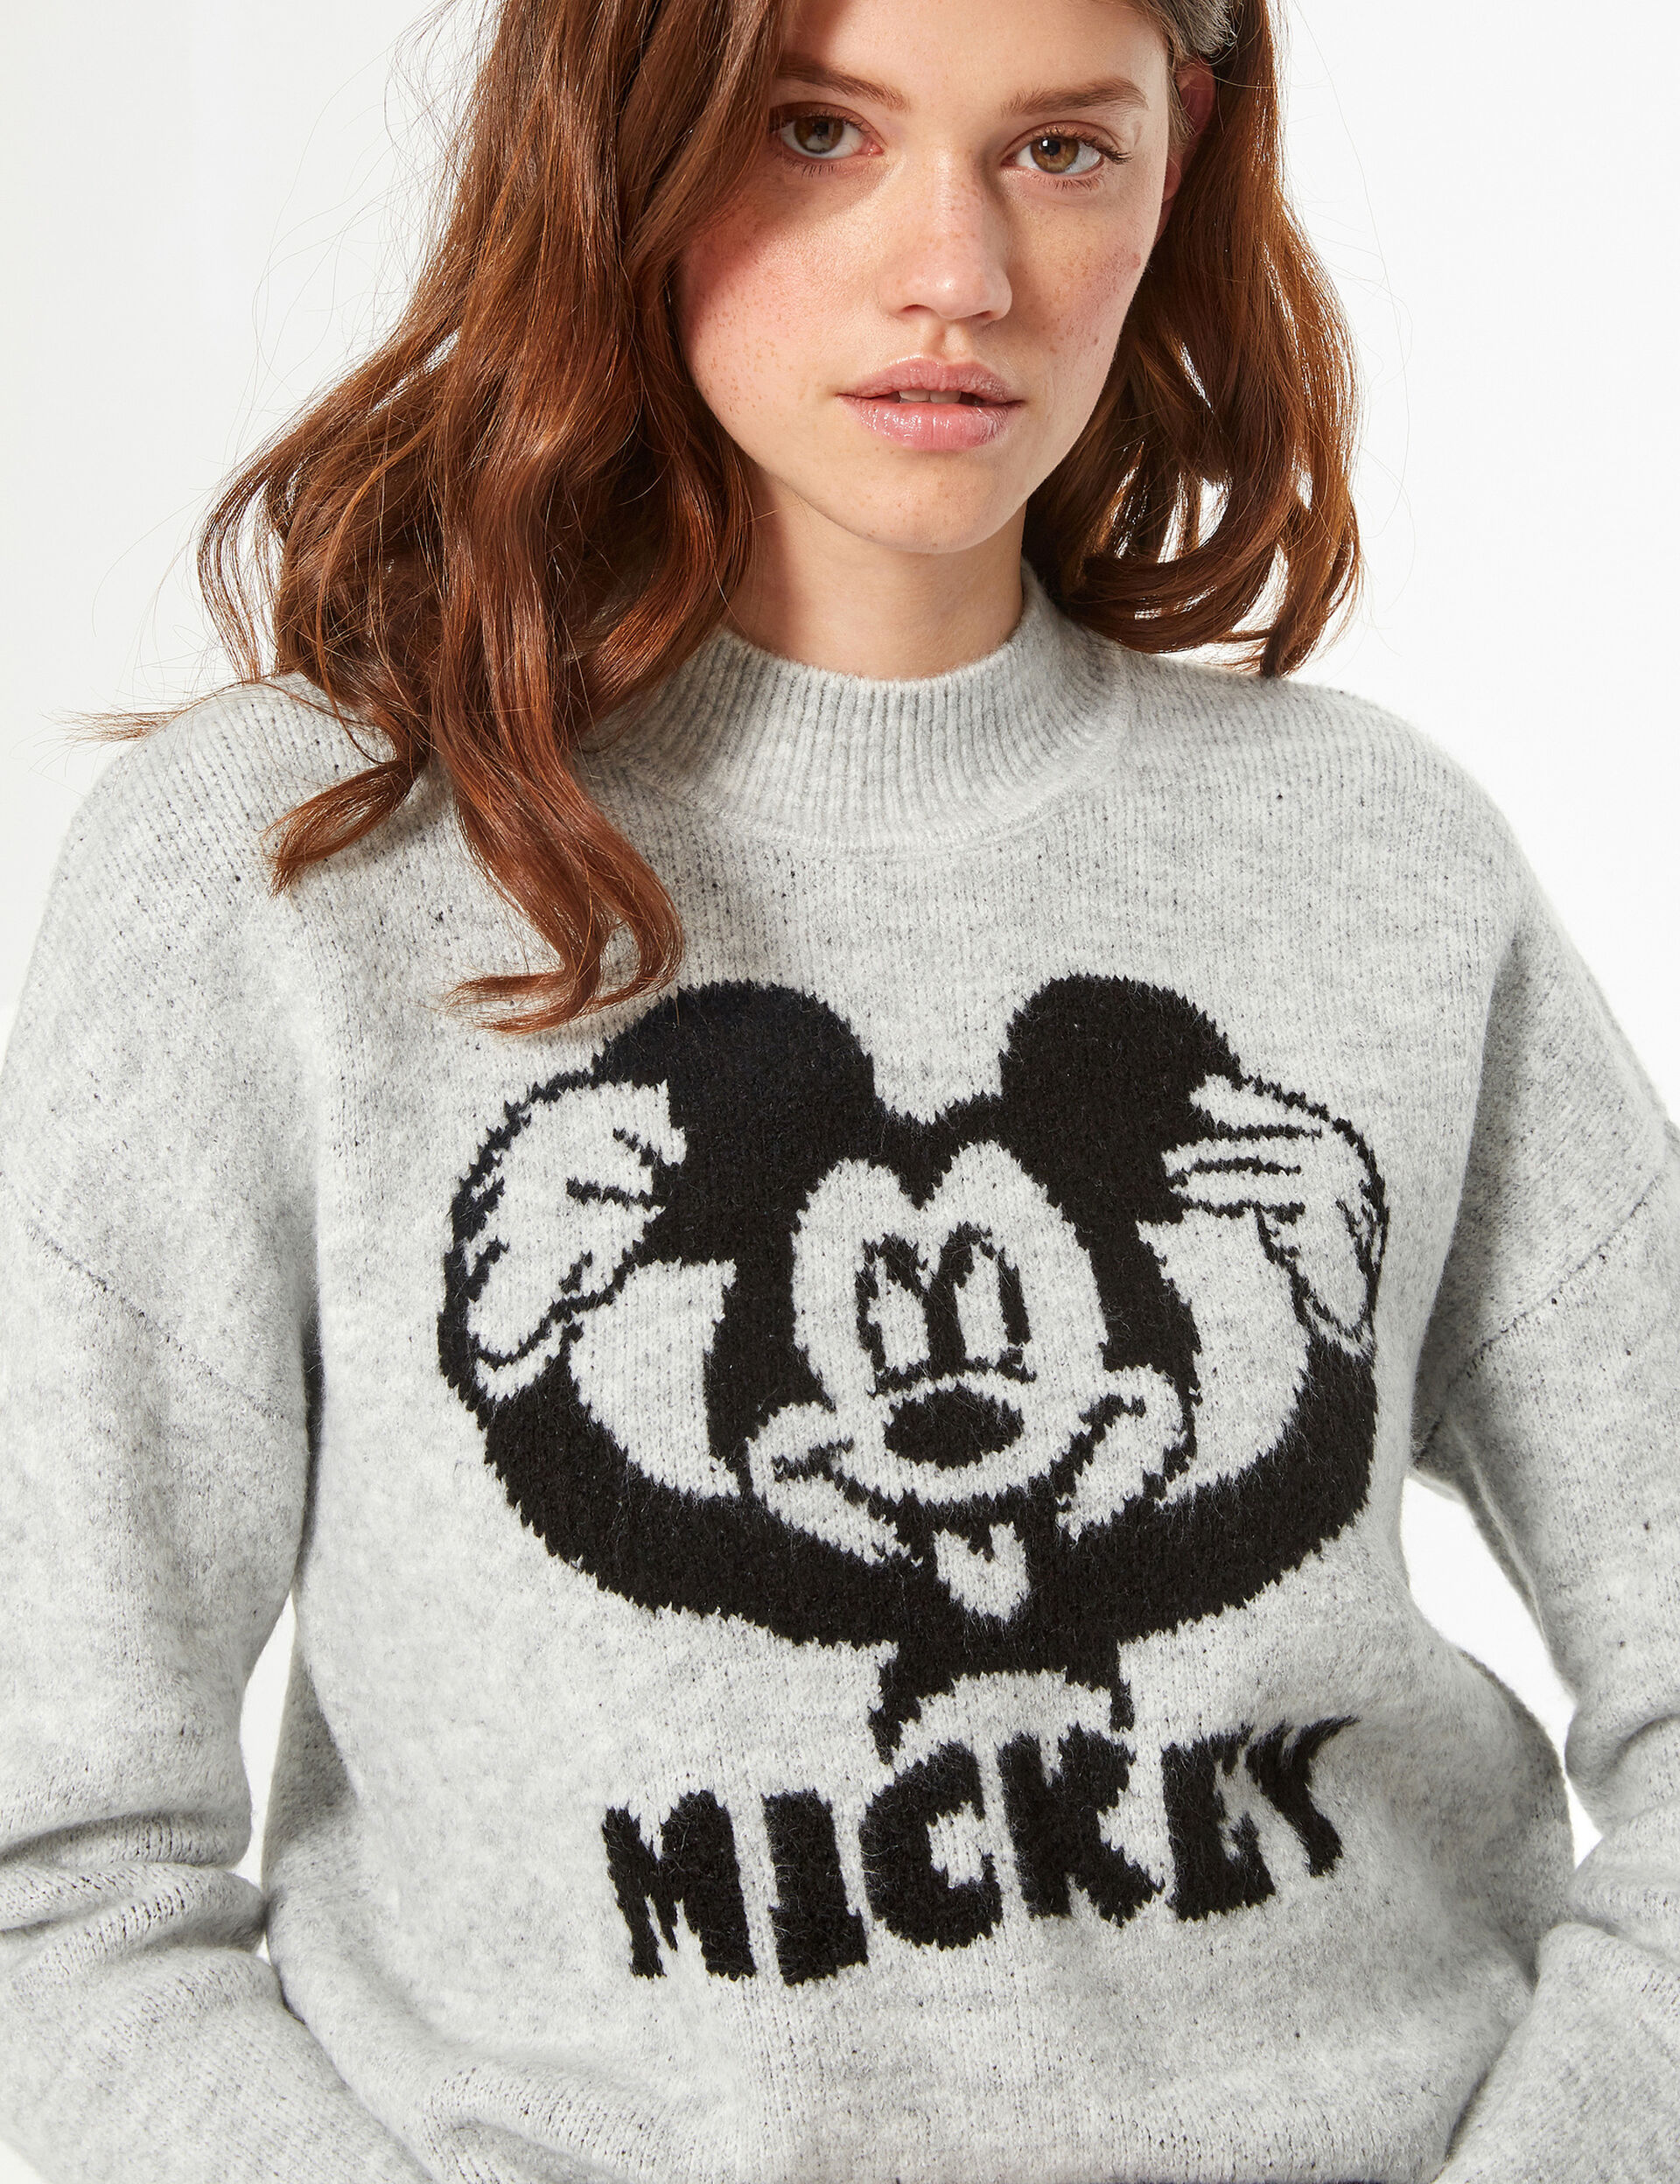 Disney mickey mouse jumper